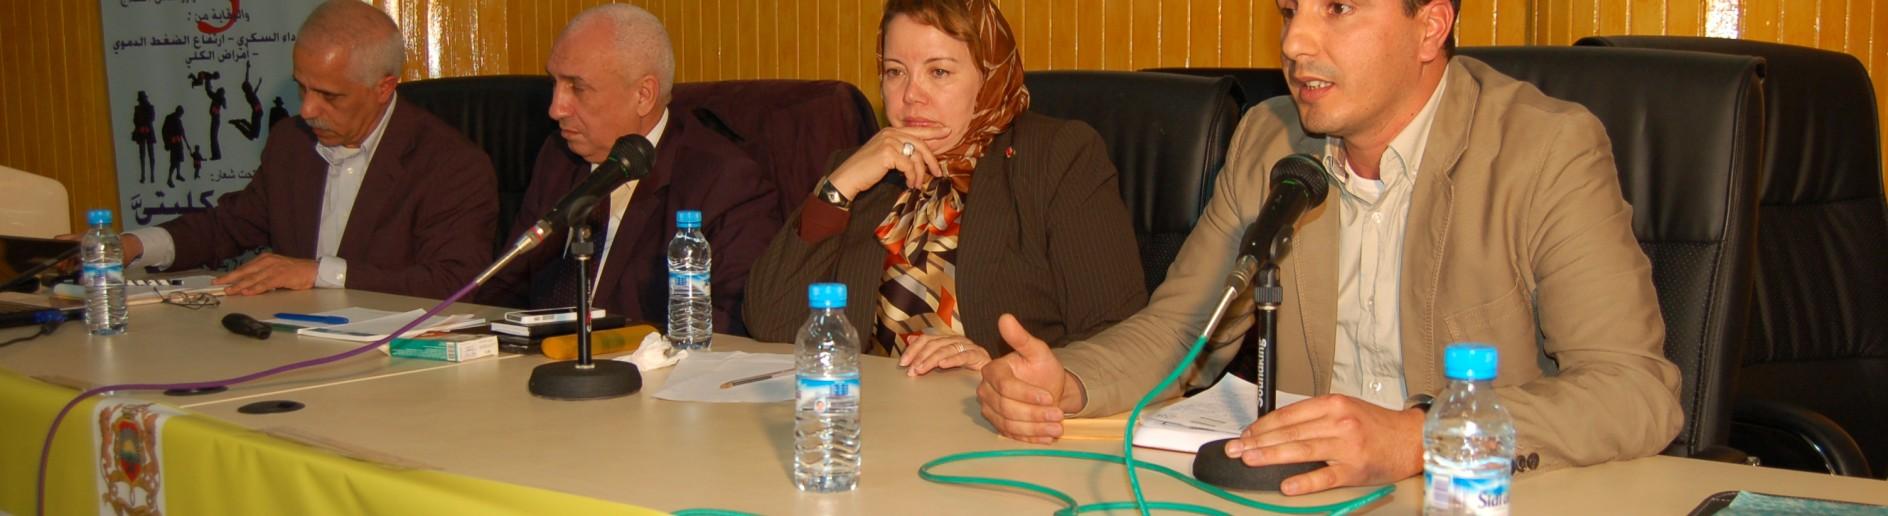 WKD 2014 Morocco